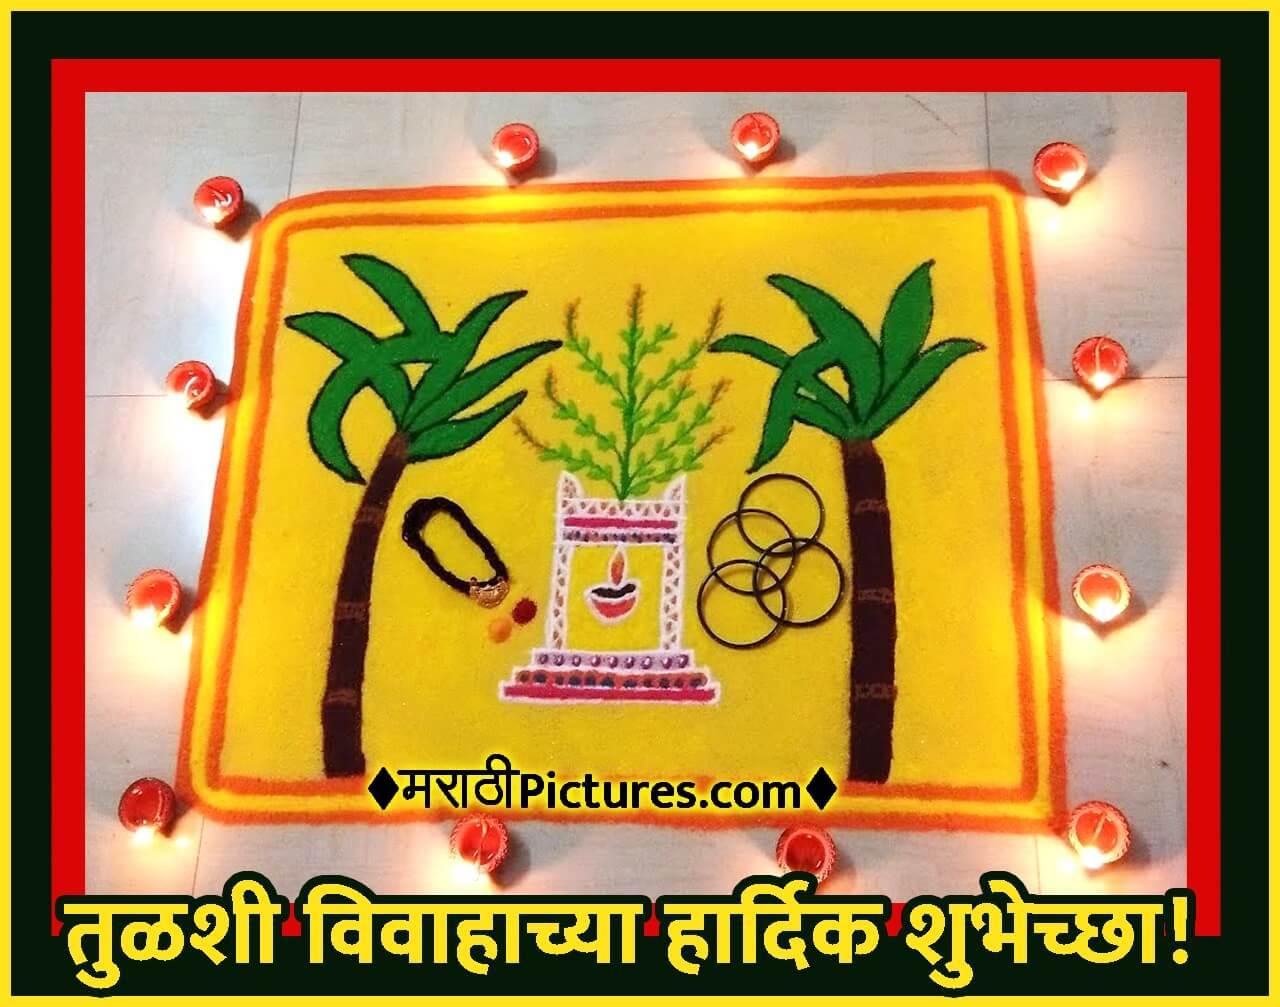 Tulsi Vivah Chya Hardik Shubhechha - Marathi Pictures ... Vadhdivas Chya Hardik Shubhechha